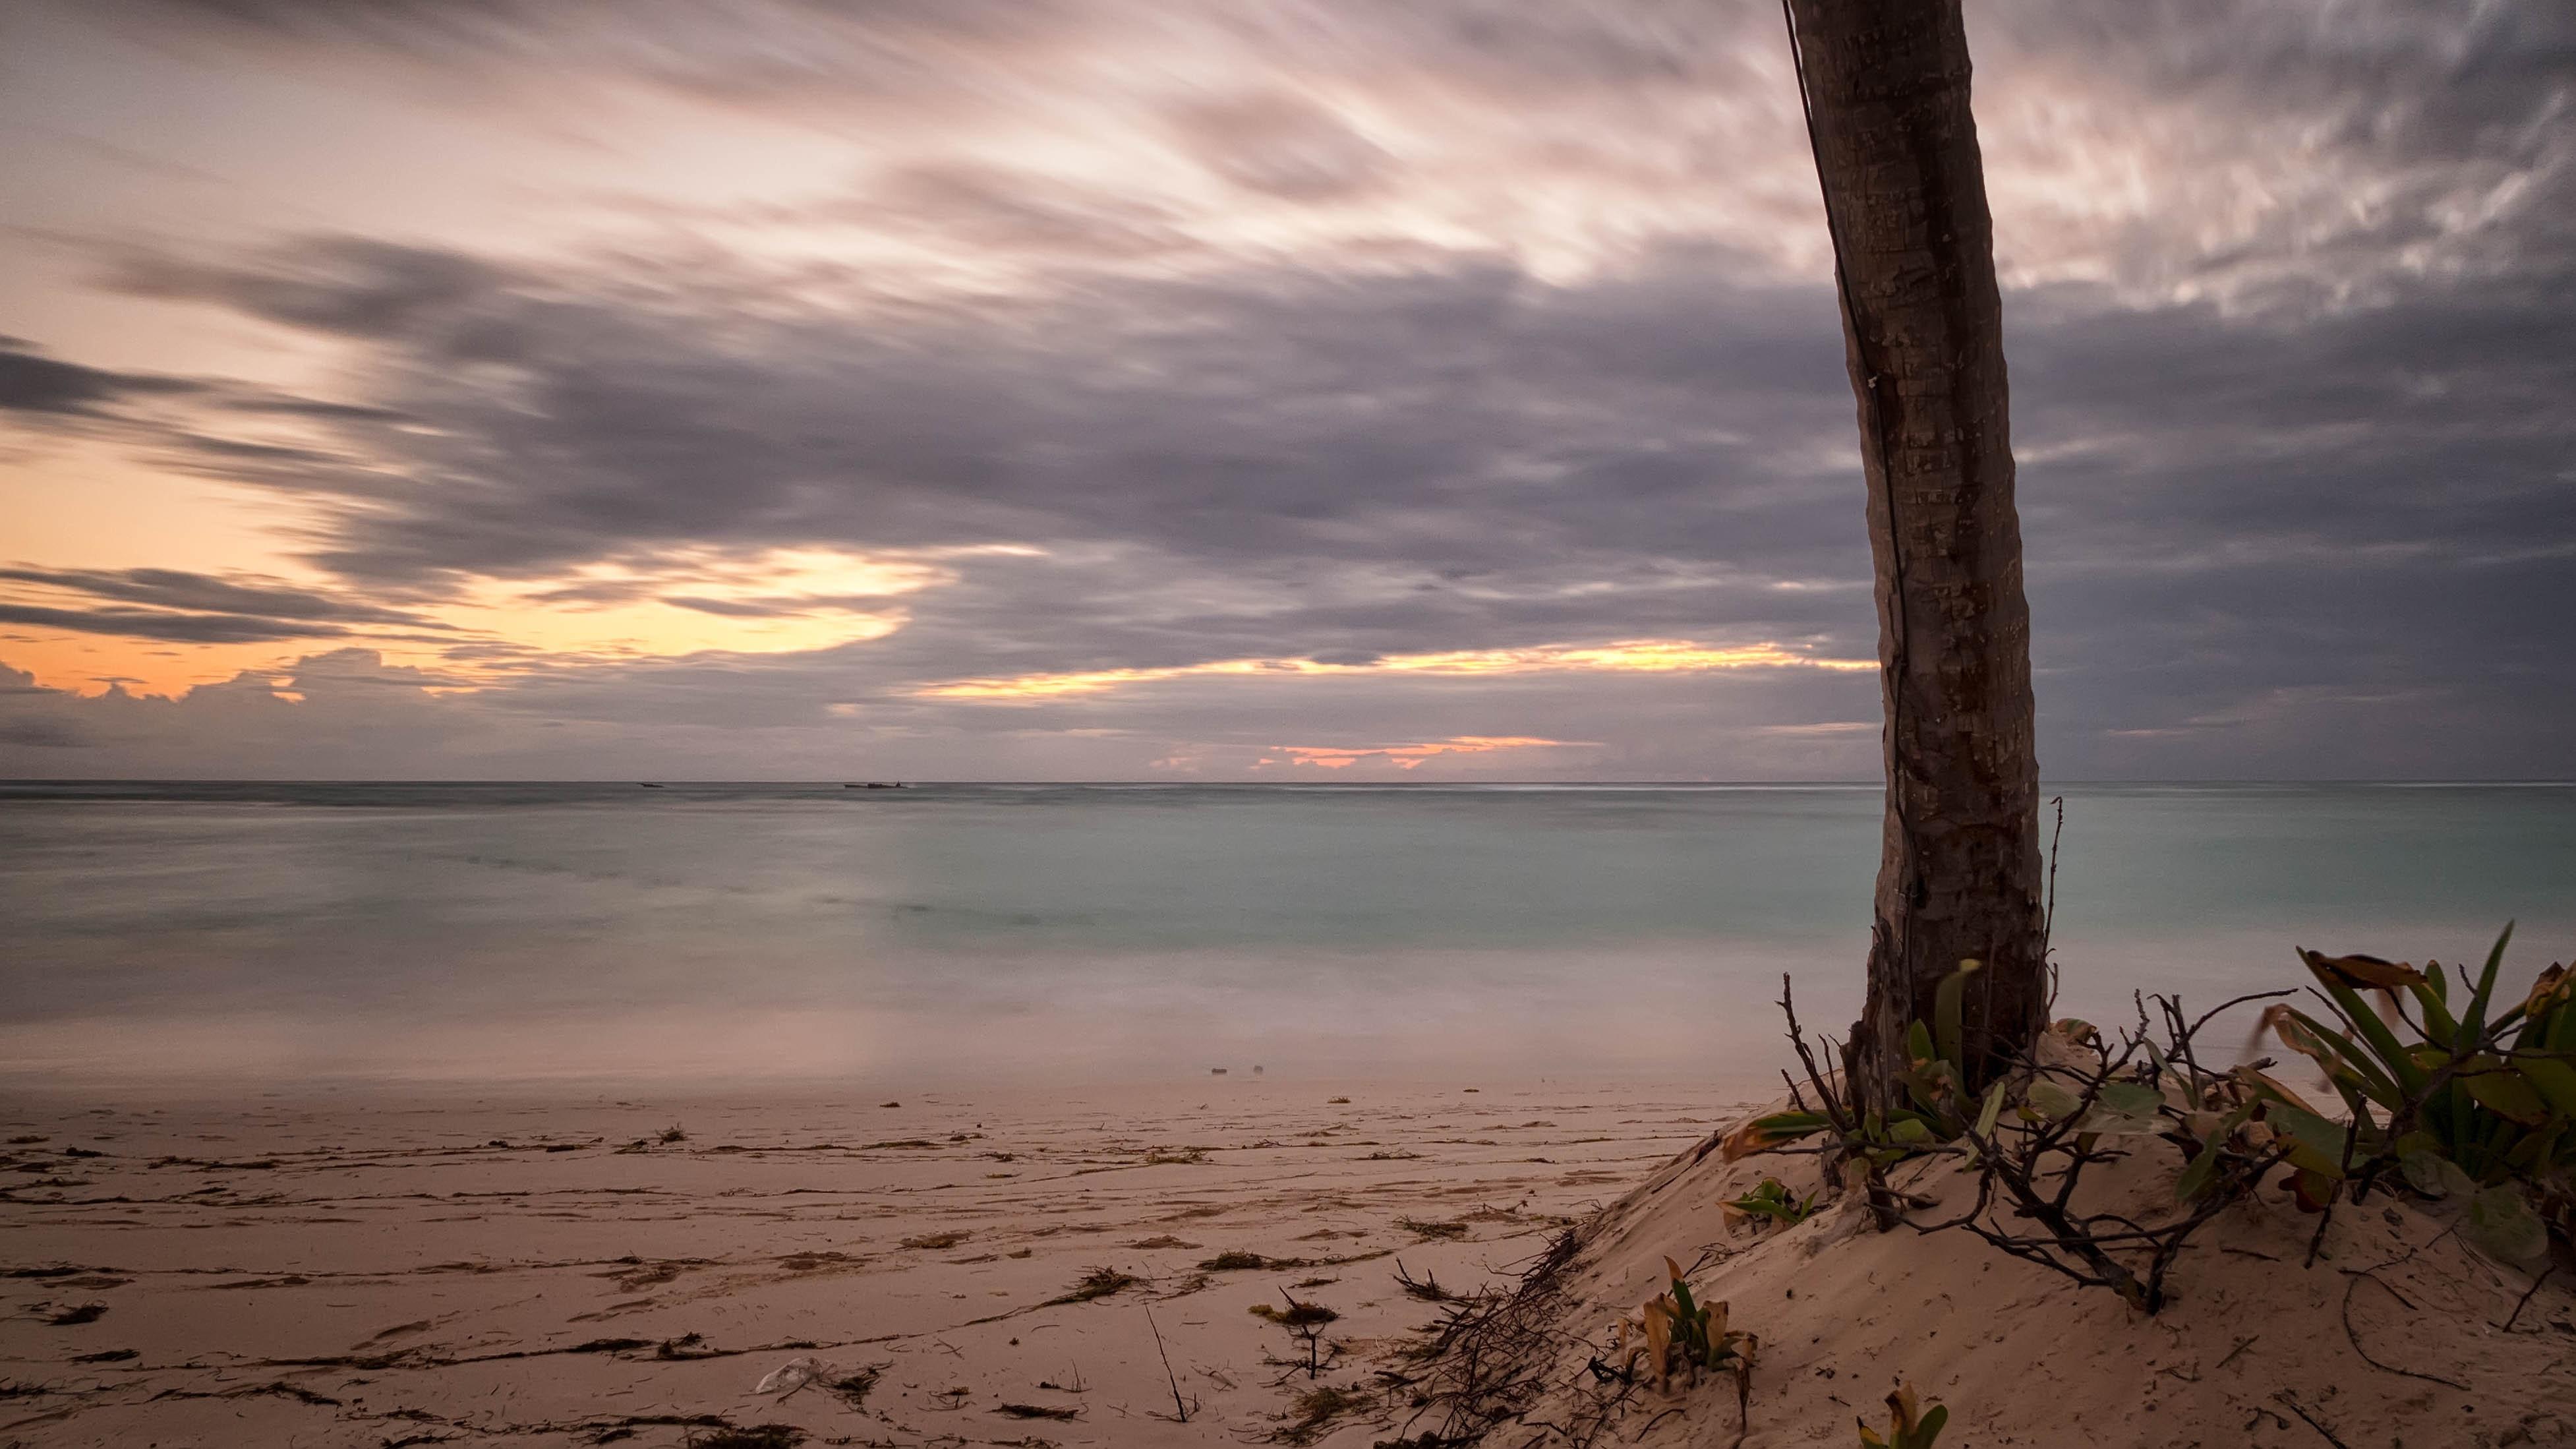 Tree on sand near body of water photo